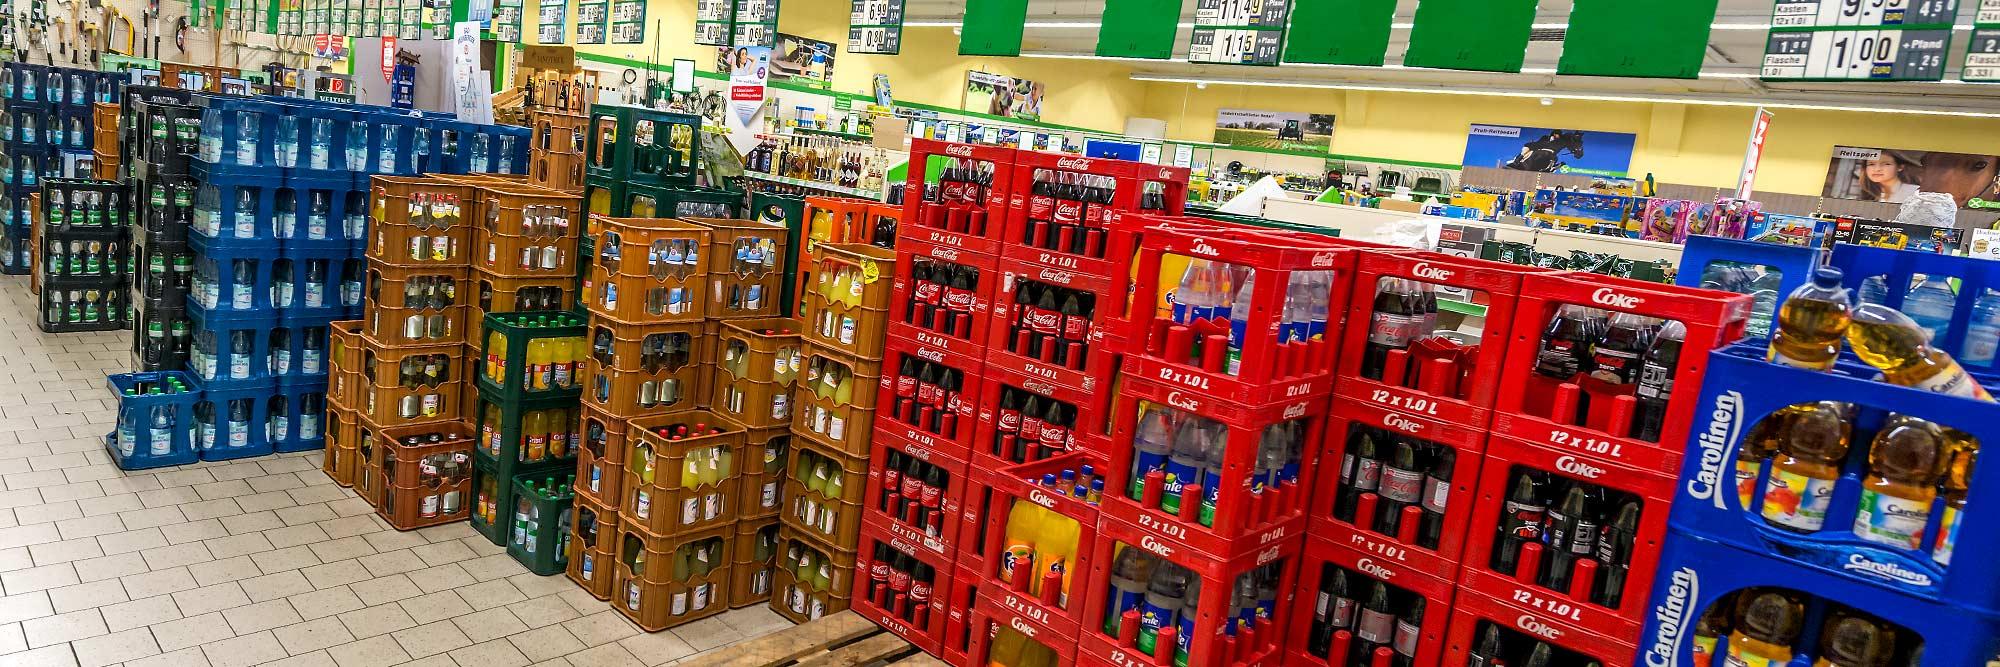 Raiffeisen Markt Ottmarsbocholt Getränke